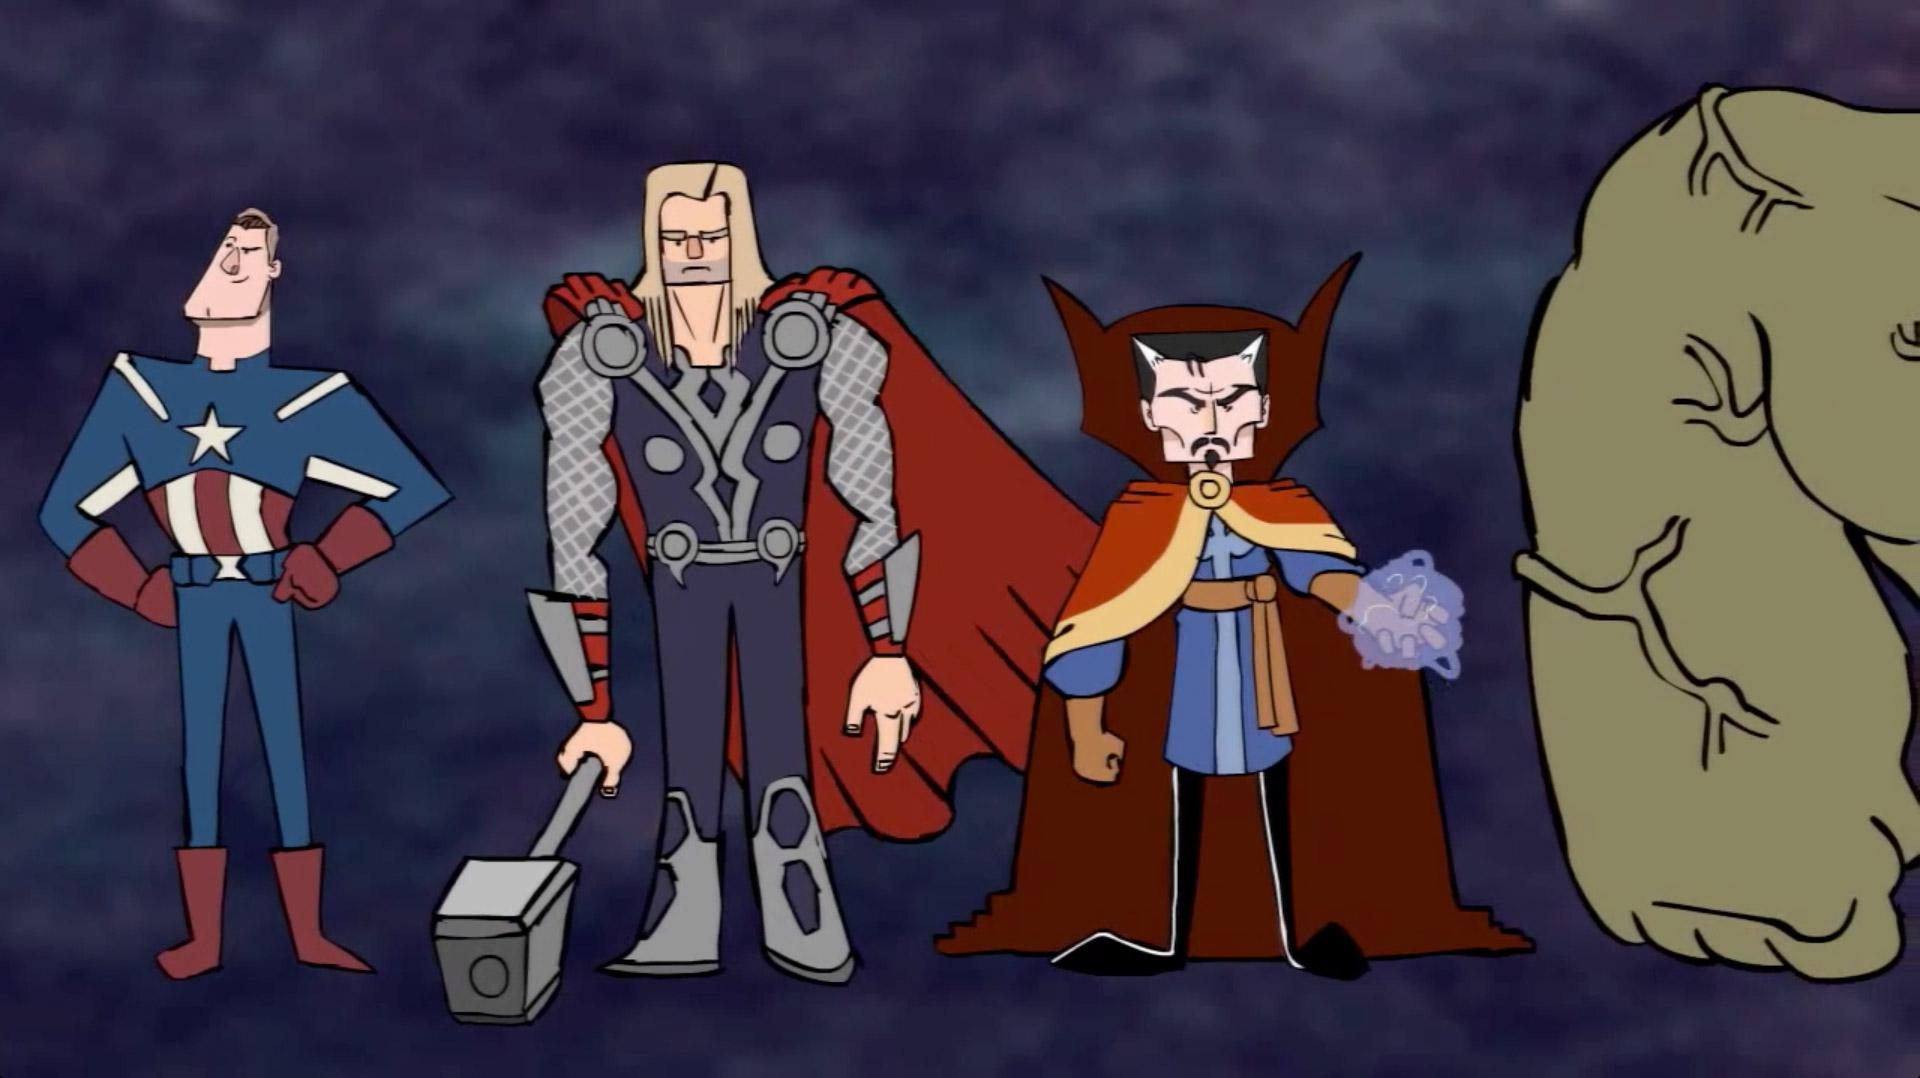 patton-oswalts-star-wars-fillbuster-gets-animated-8.jpg